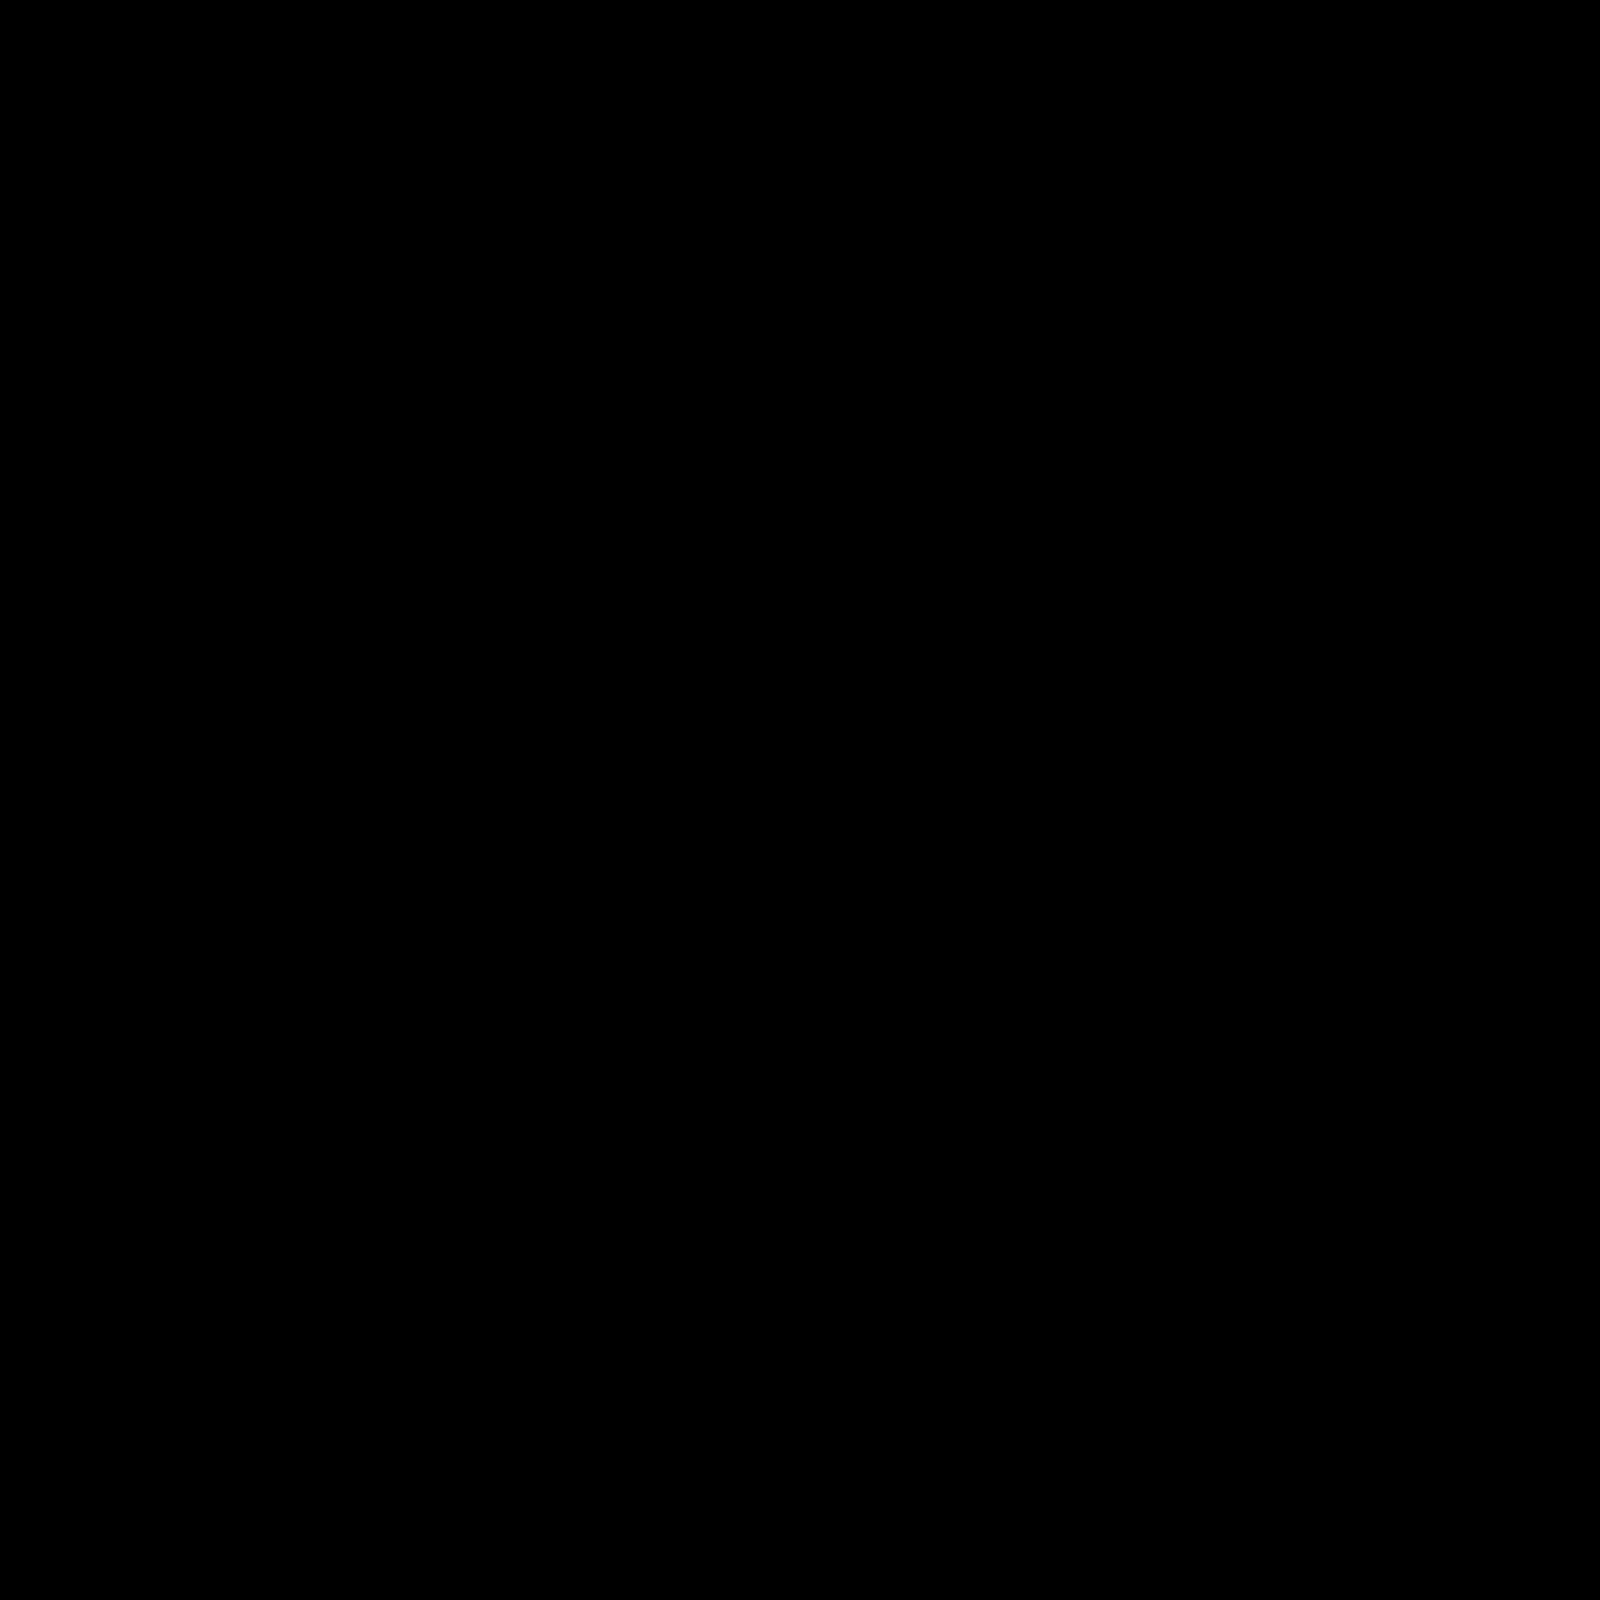 Teaser Filled icon